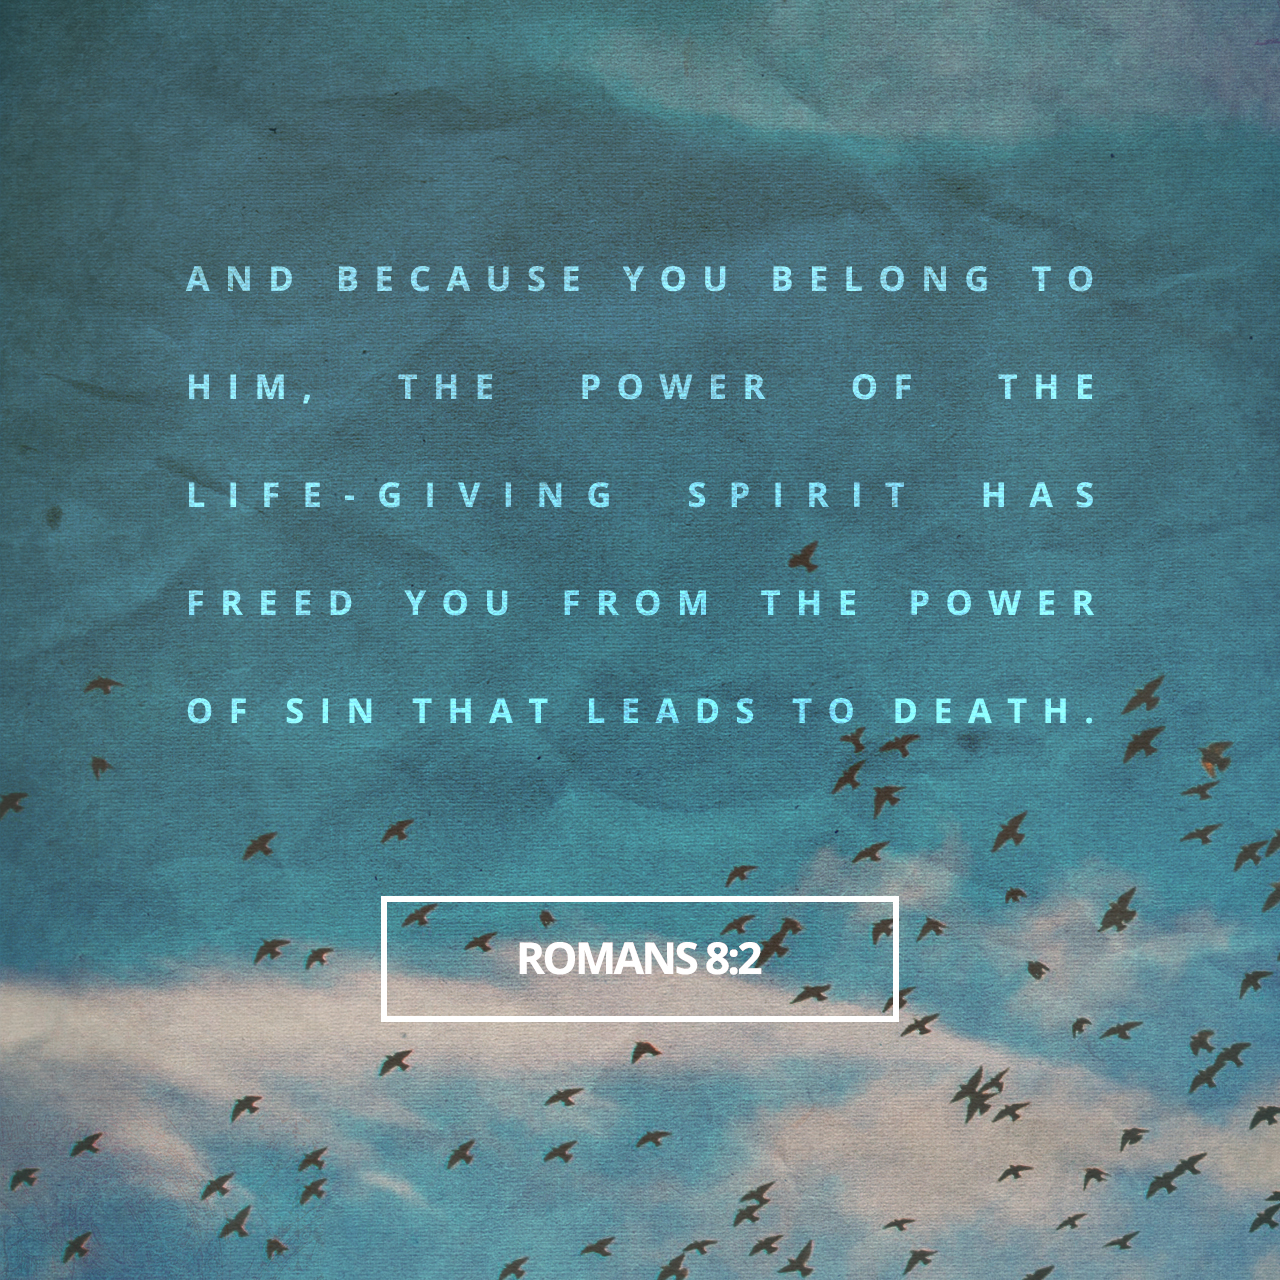 Romans 8:2 (JPG)